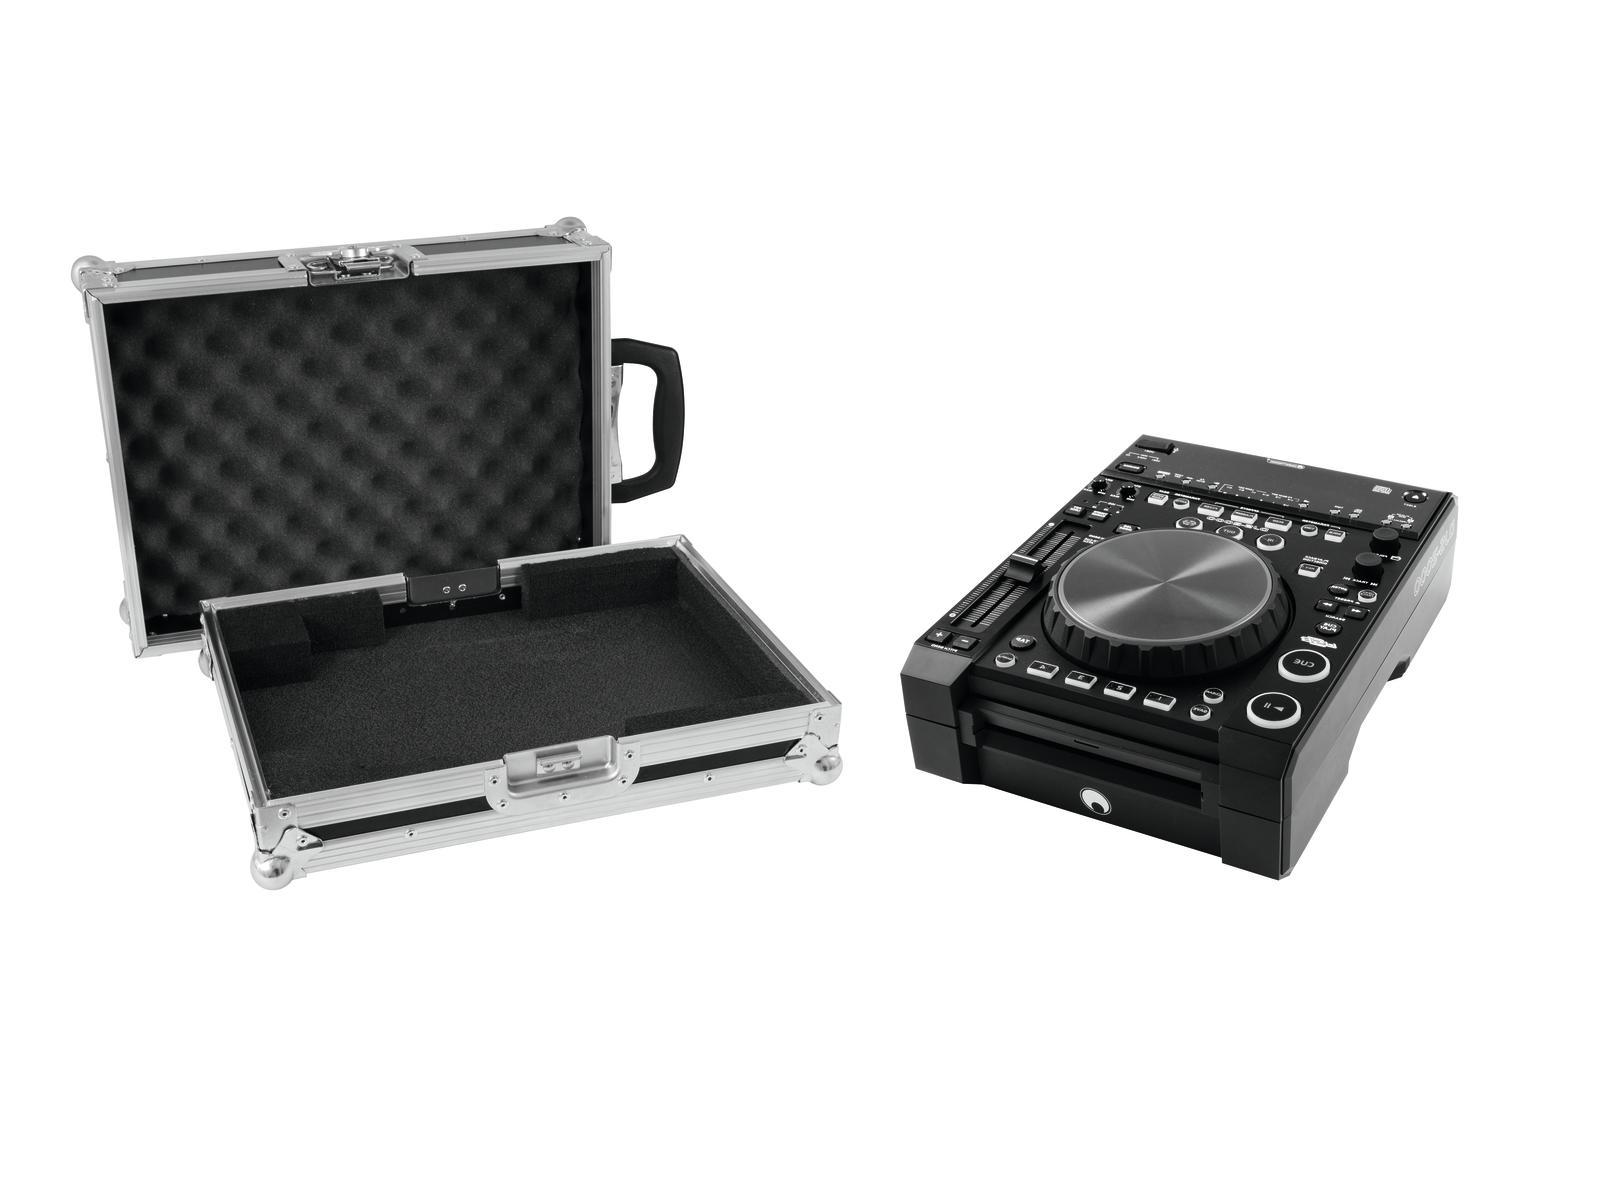 eurolite-set-djs-2000-dj-player-case